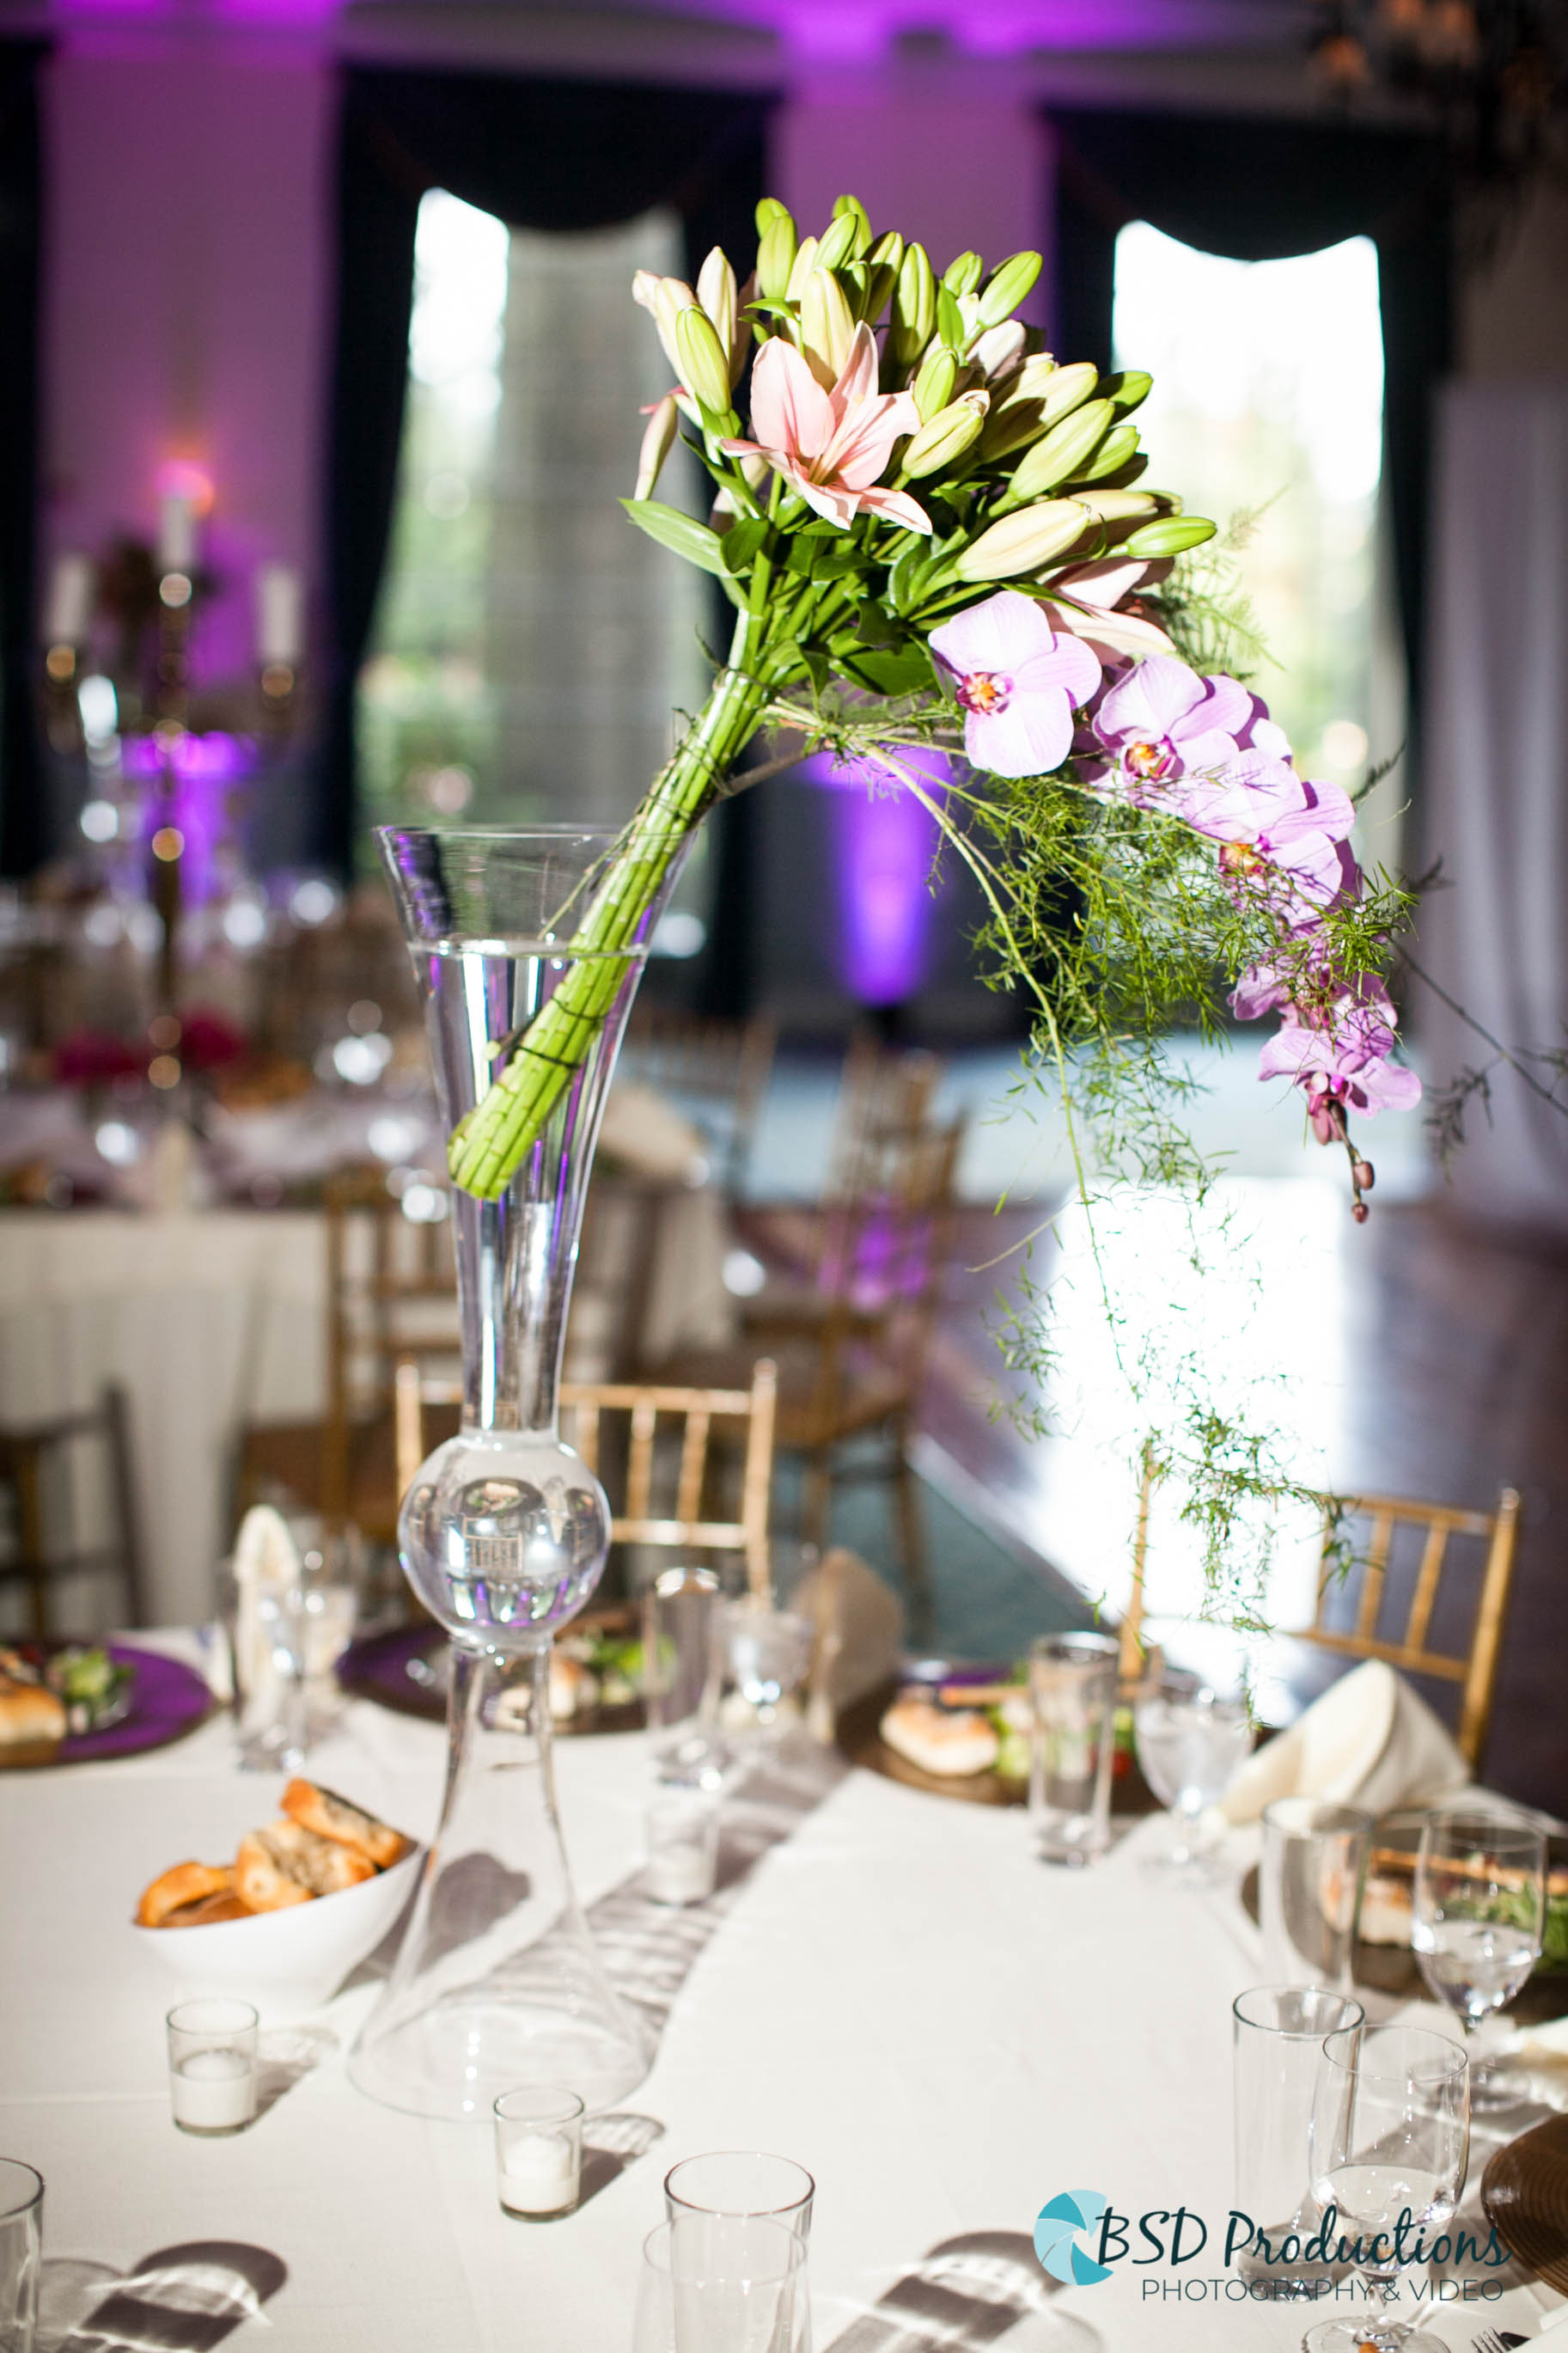 IMG_9847 Wedding – BSD Productions Photography